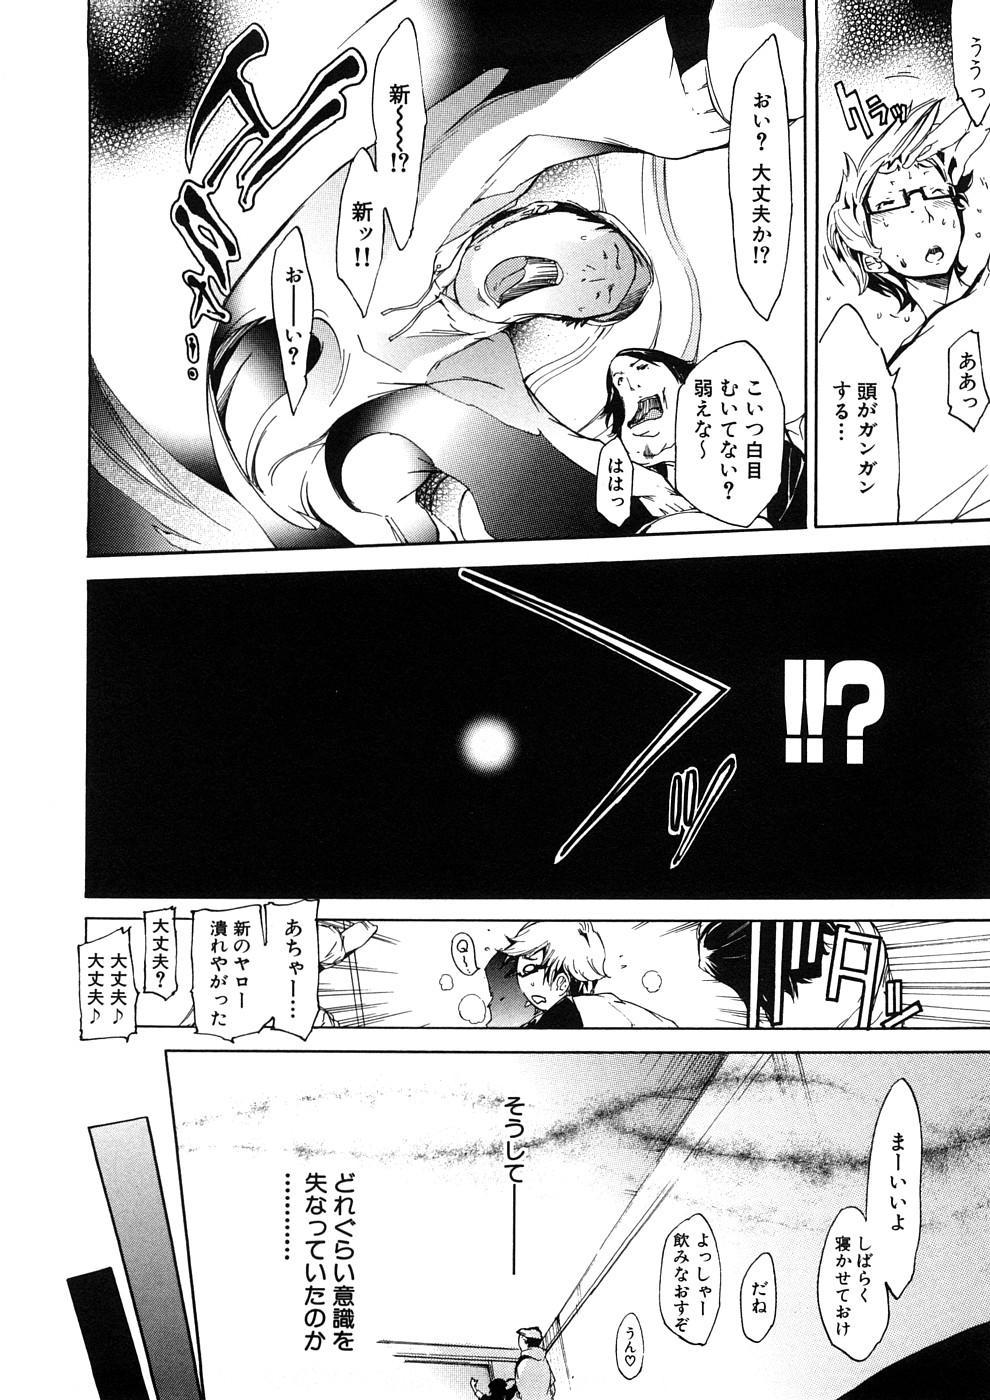 Geki Yaba Anthology Vol. 1 - Naka ni Dashite yo 30